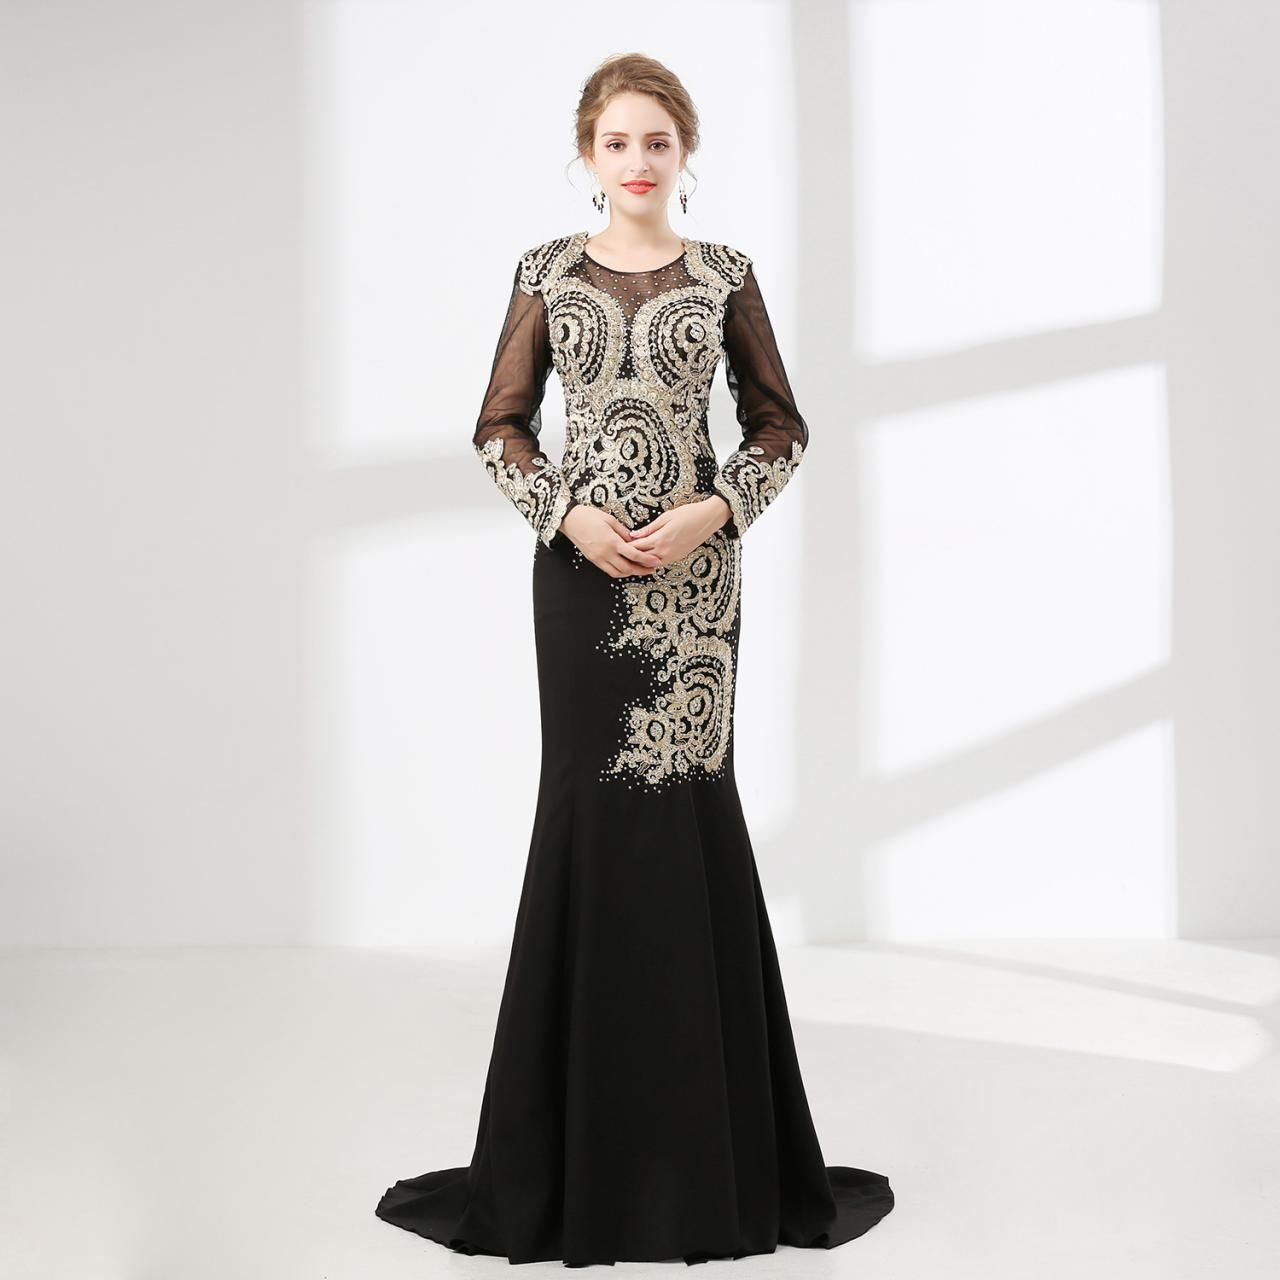 Vintage black mermaid prom dresses long sleeve outfits